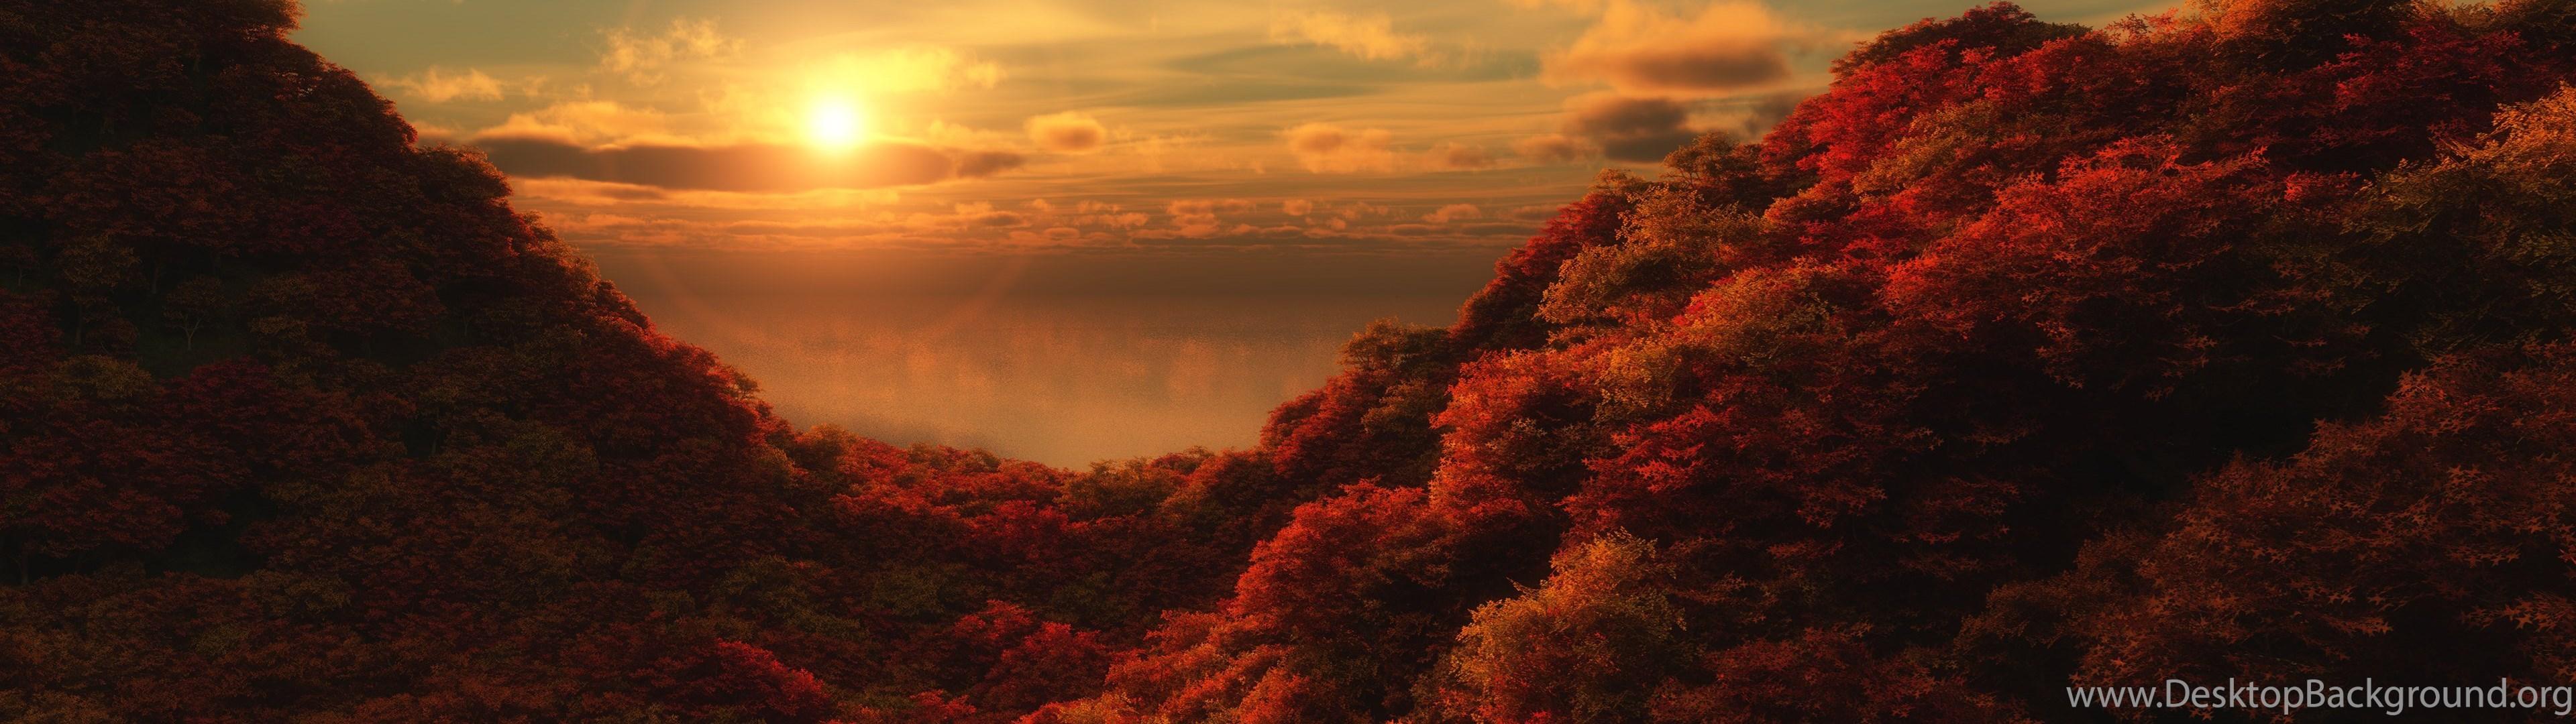 HOT Morning Colors HD Wallpapers. 4K Wallpapers Desktop